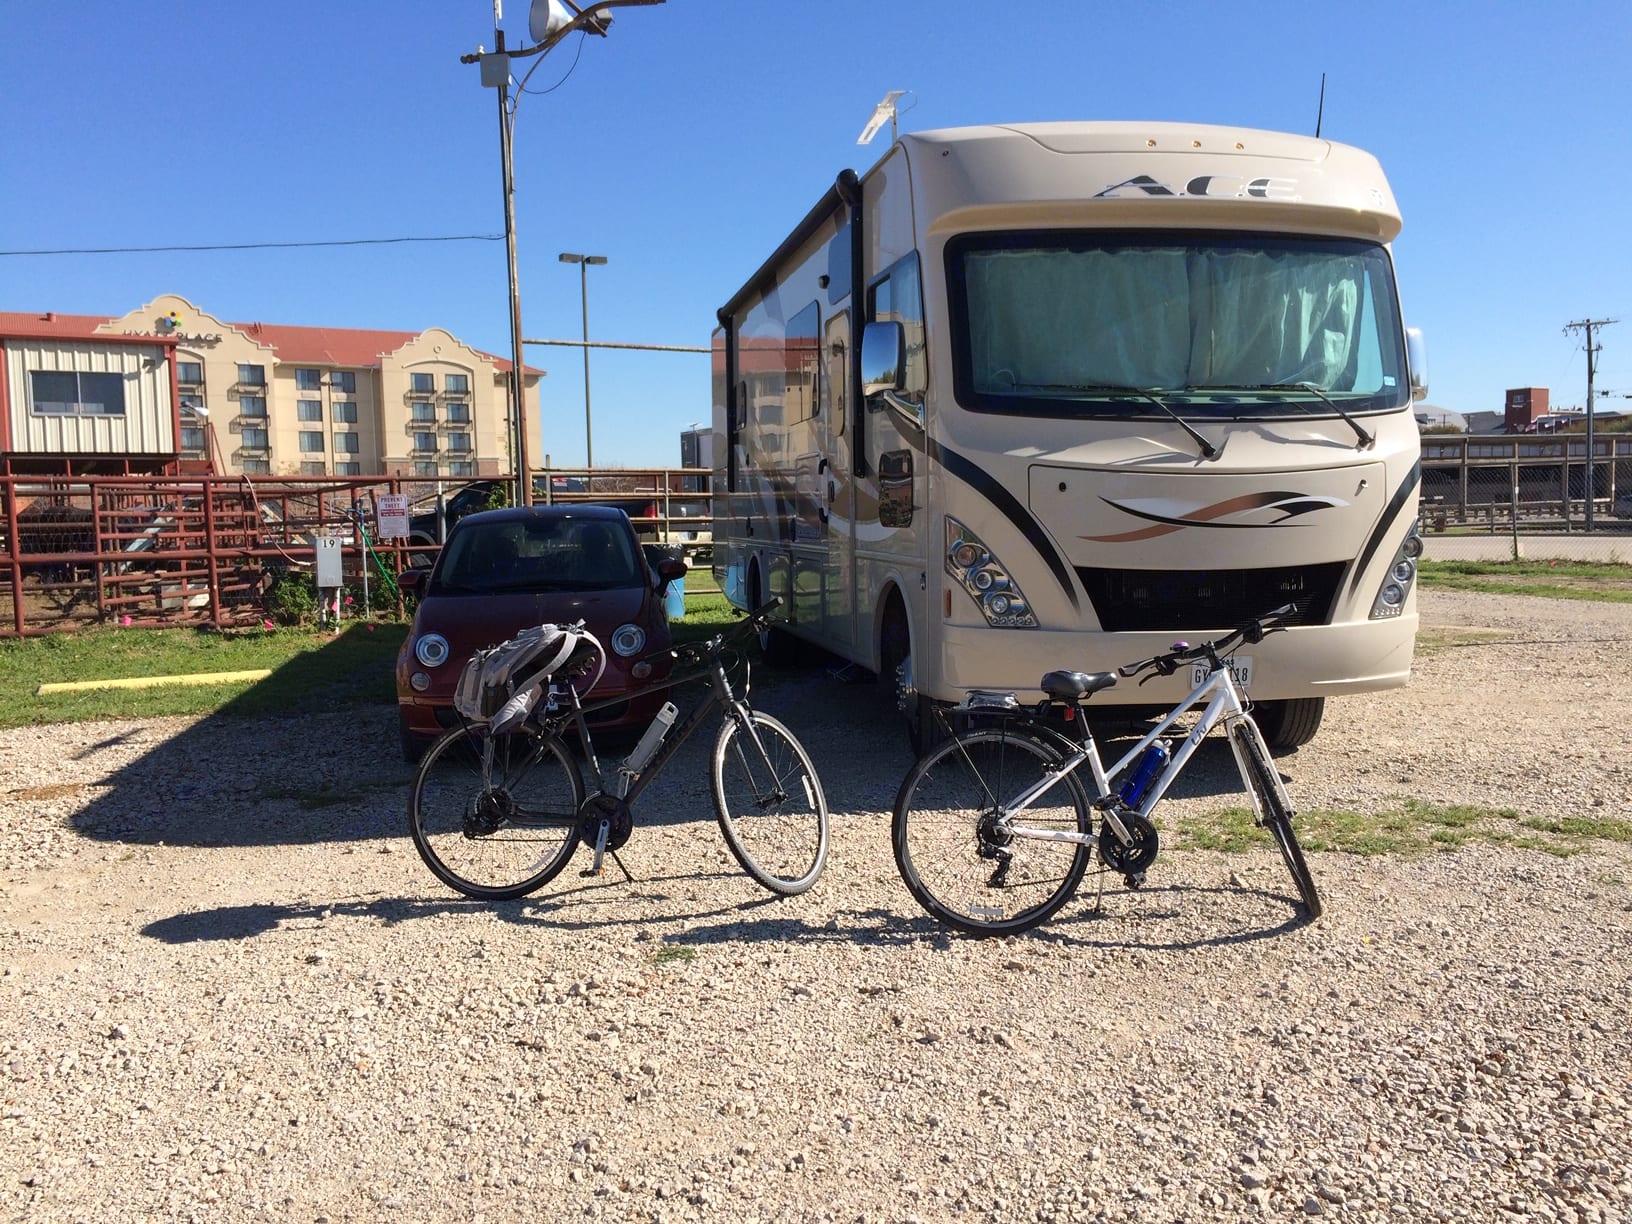 Galveston Island was fun with our 2 bikes!. Thor Motor Coach A.C.E 2016